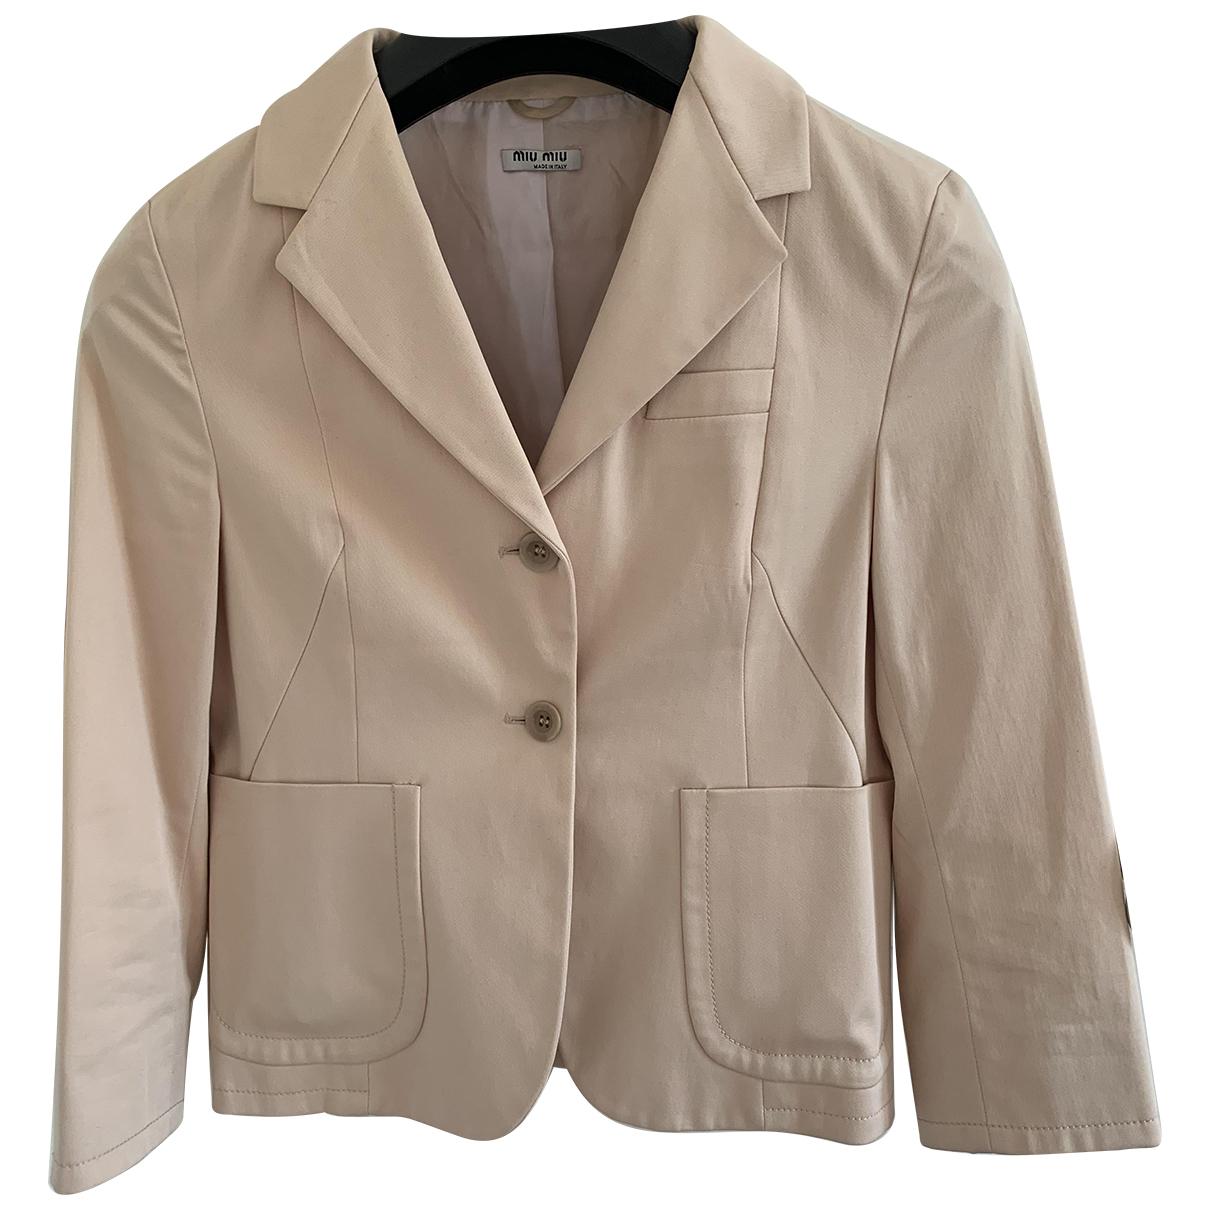 Miu Miu N Beige Cotton jacket for Women 40 IT